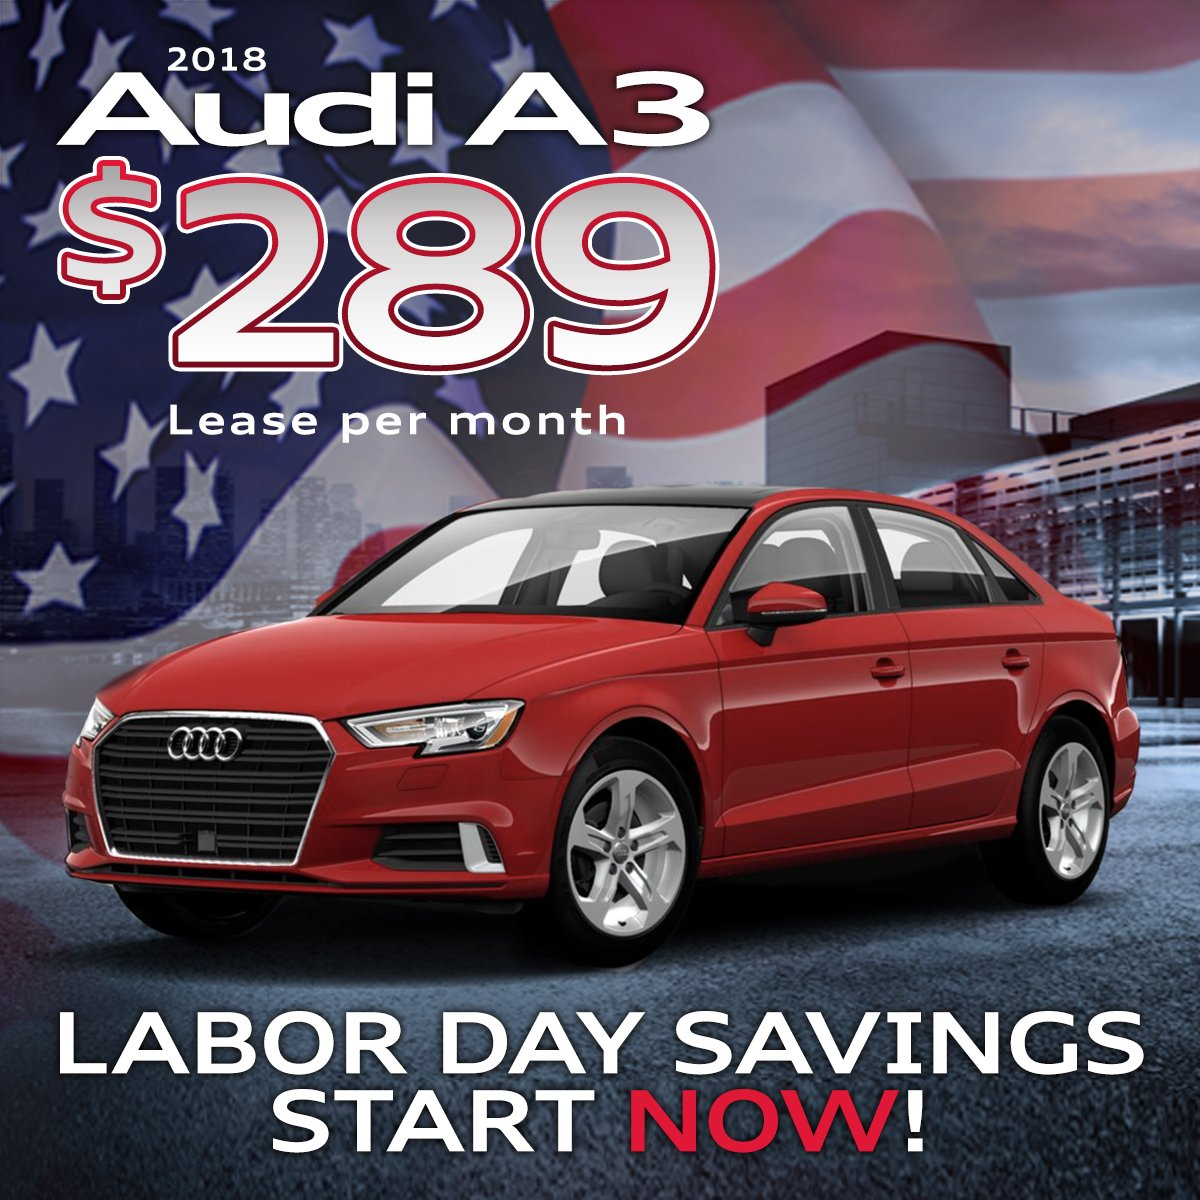 Audi Fort Lauderdale AudiFTL Twitter - Audi fort lauderdale